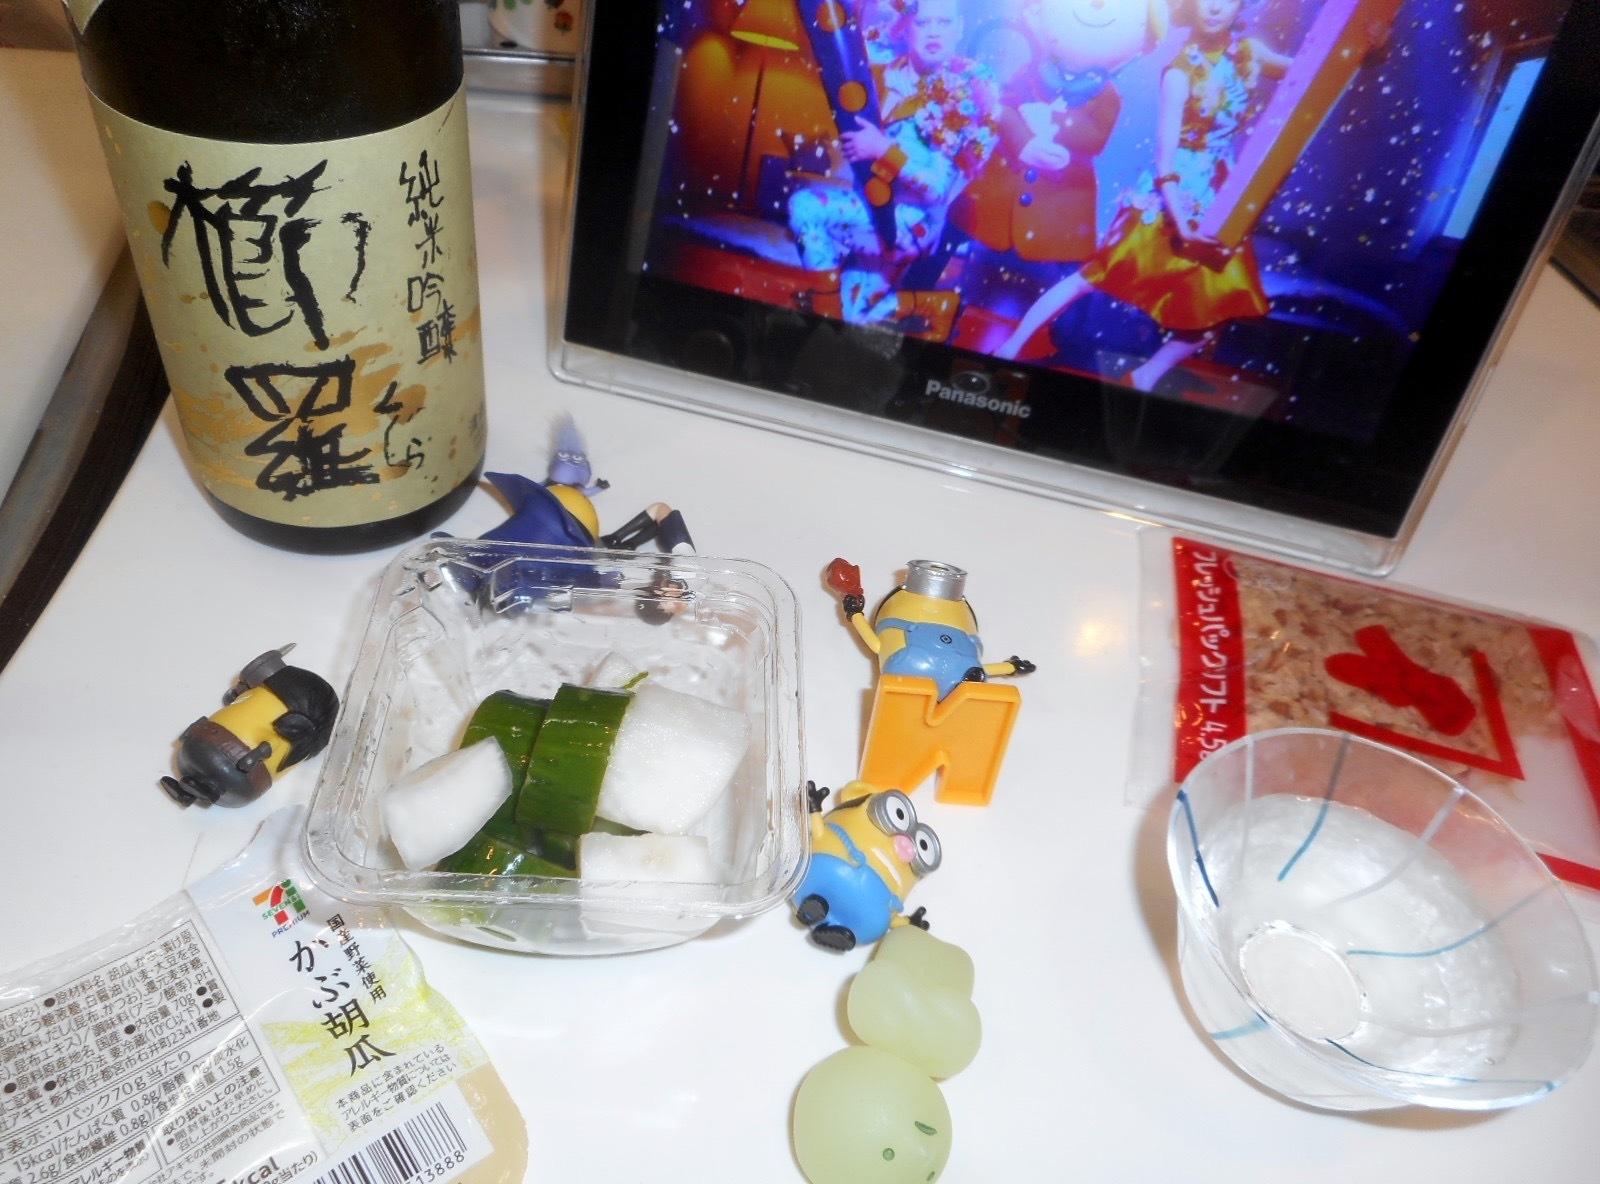 kujira2017_3_4.jpg